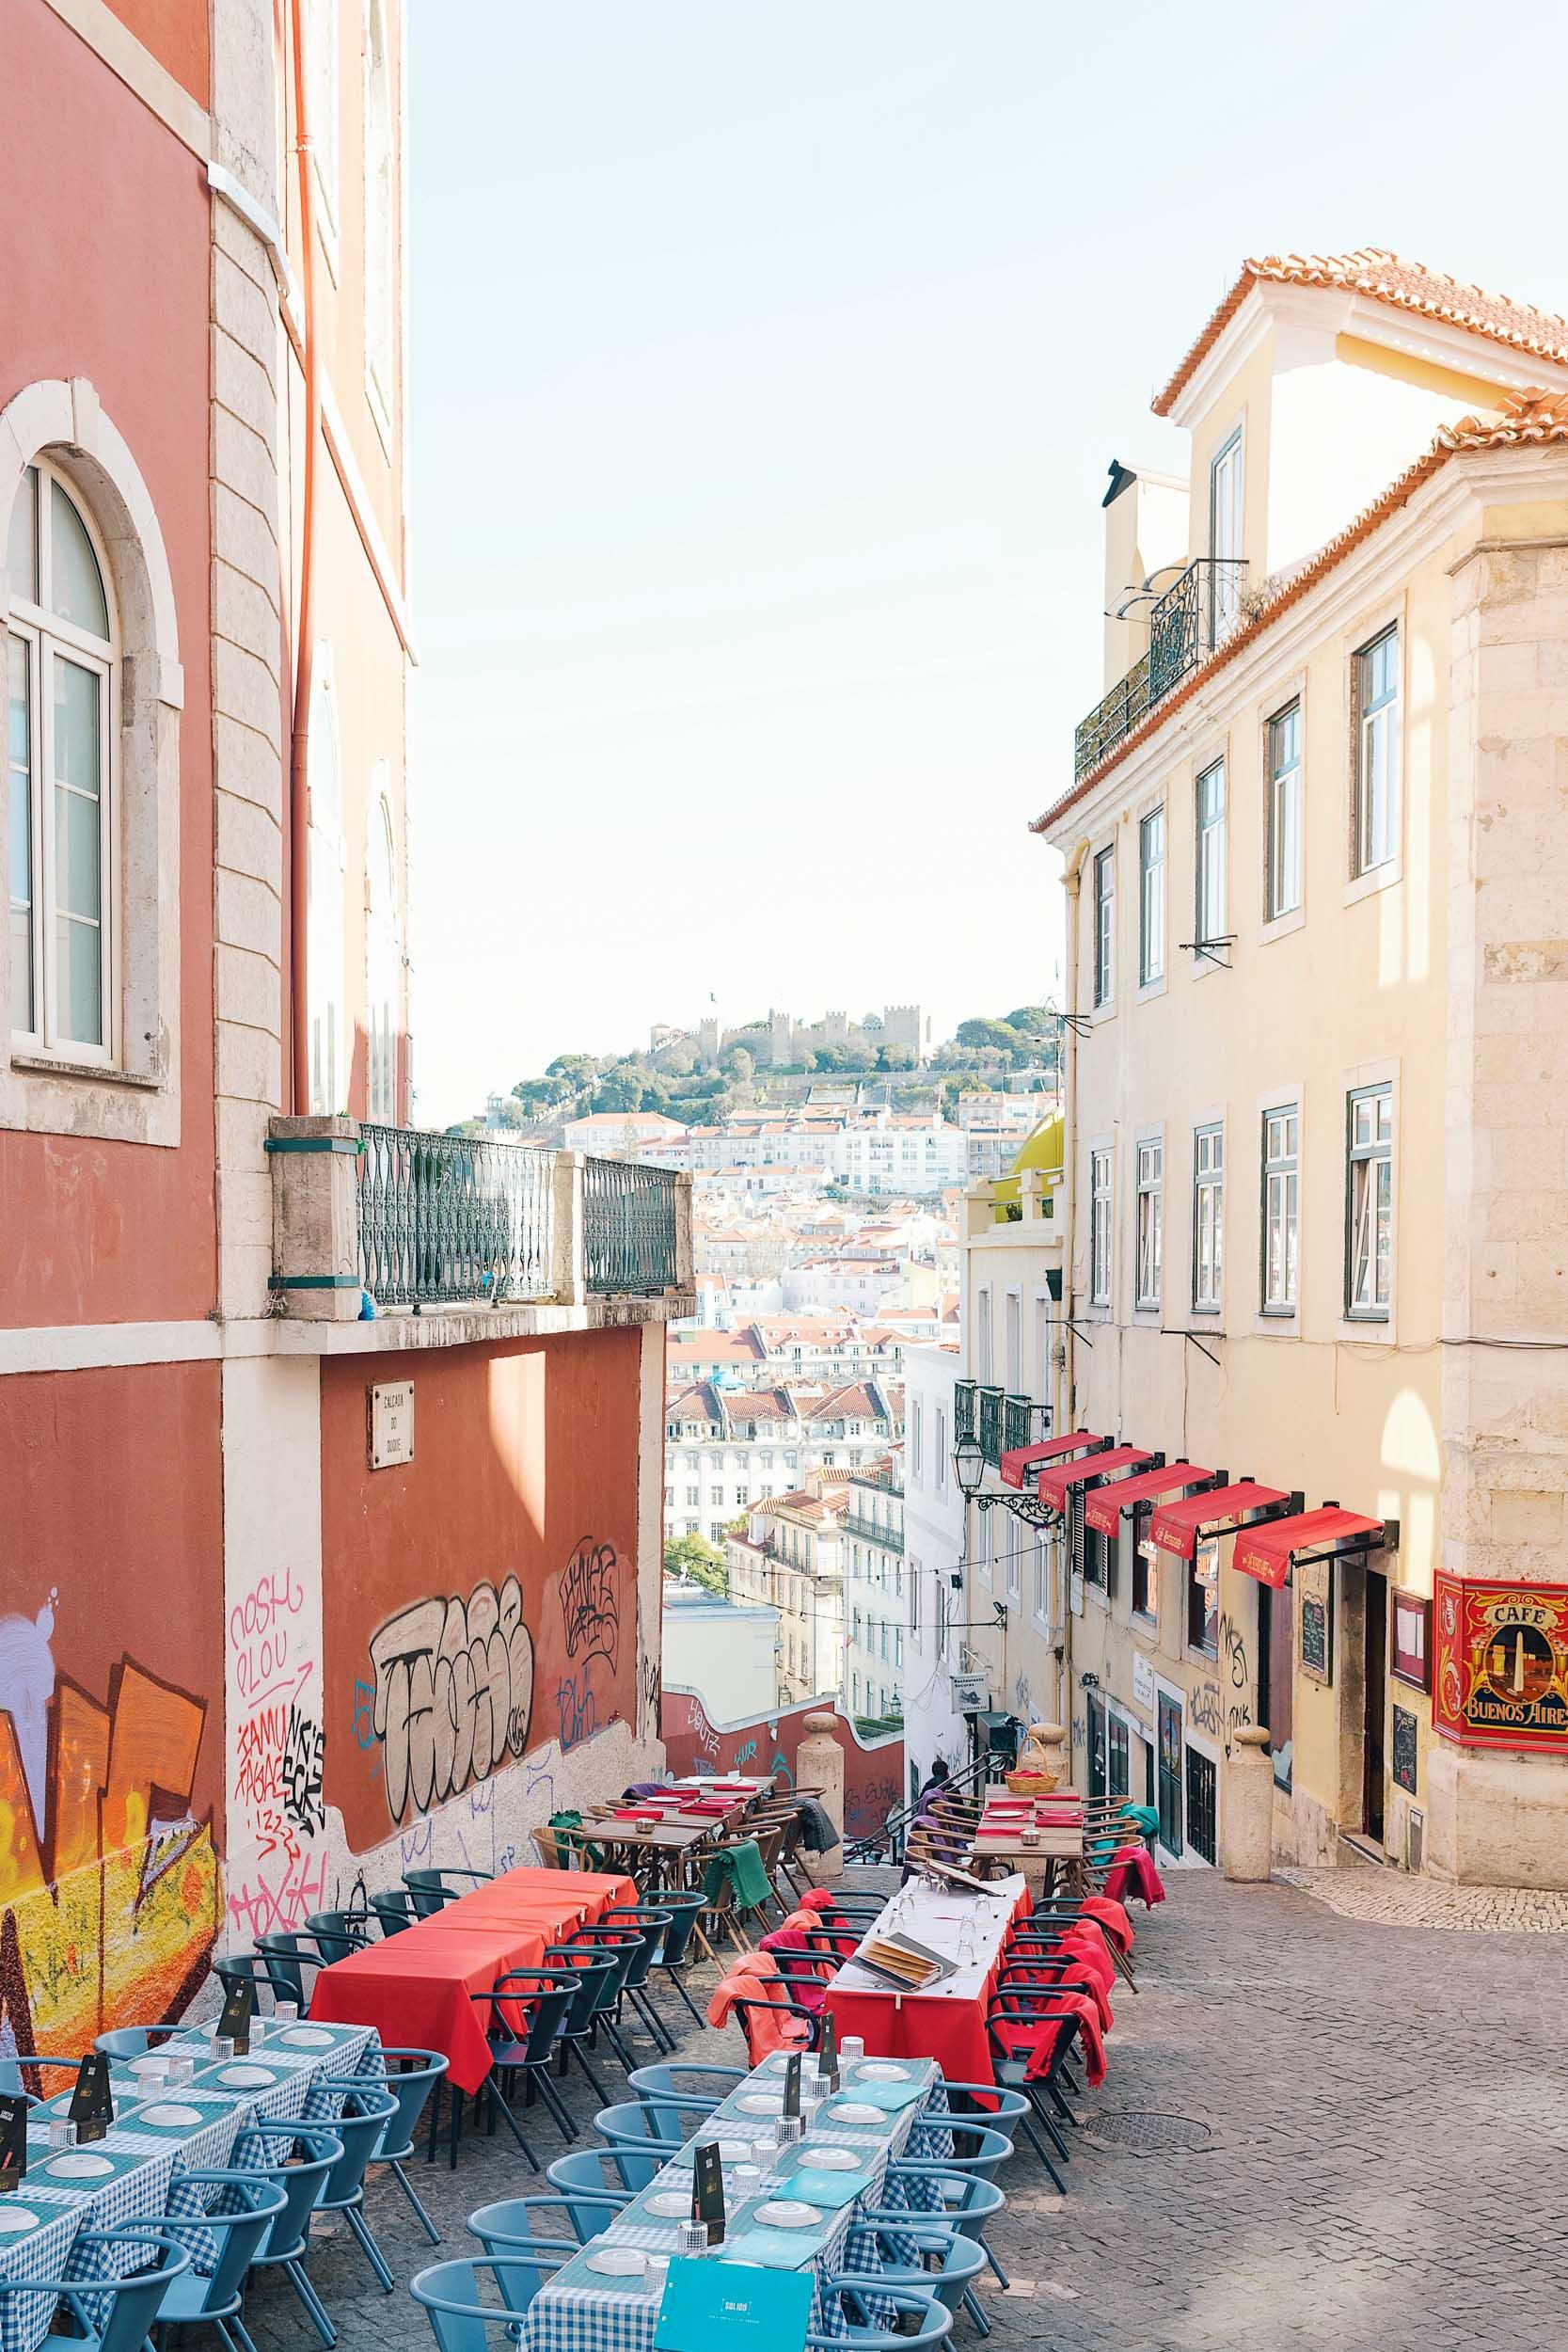 Chiado in Lisbon